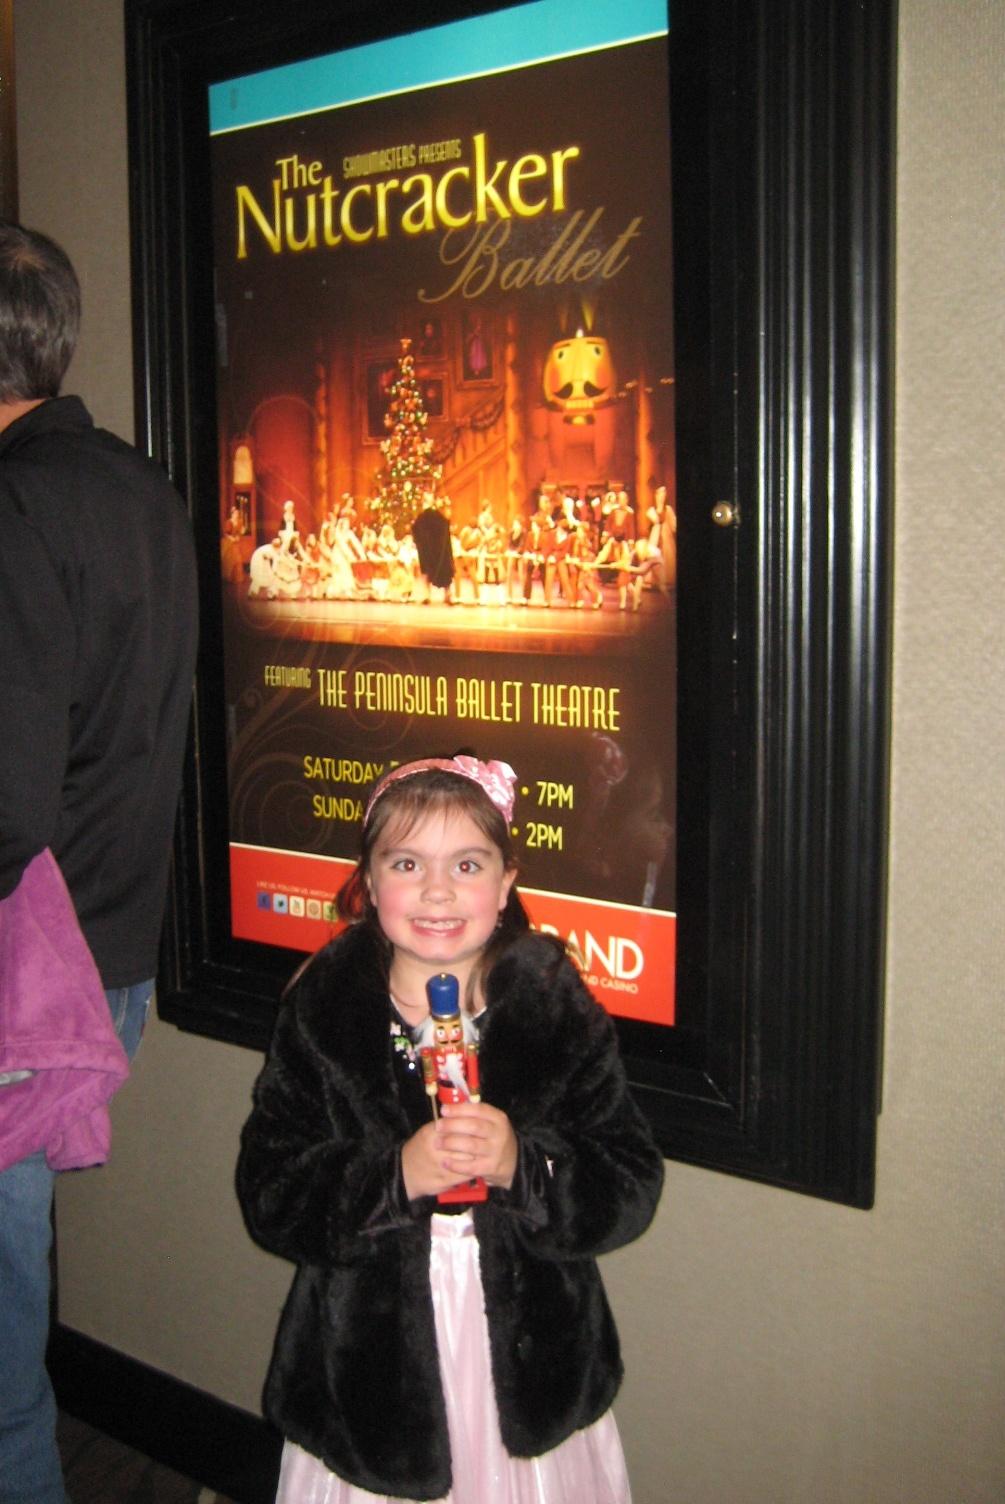 Fabienne Hansen At Nutcracker in the Grand Theatre